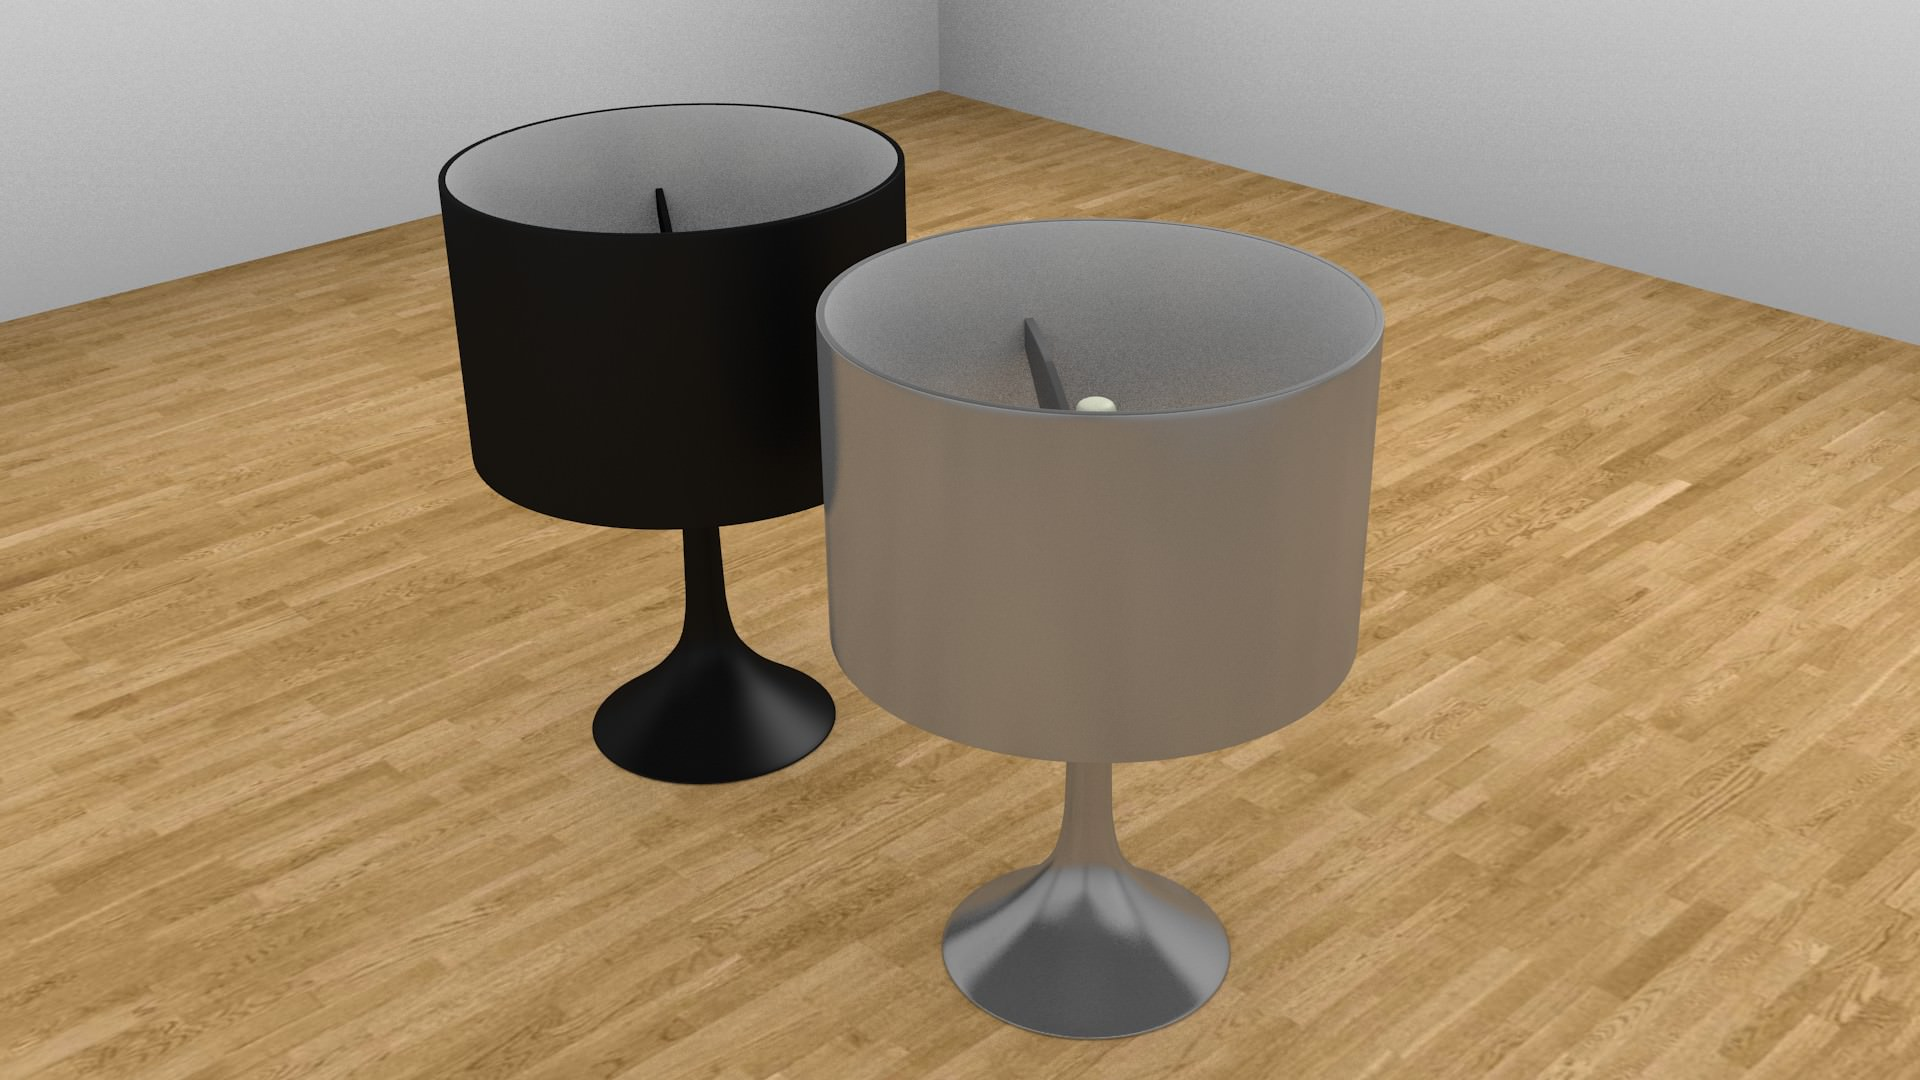 3D Flos Spun Lamp | CGTrader for Flos Spun Table Lamp  56mzq